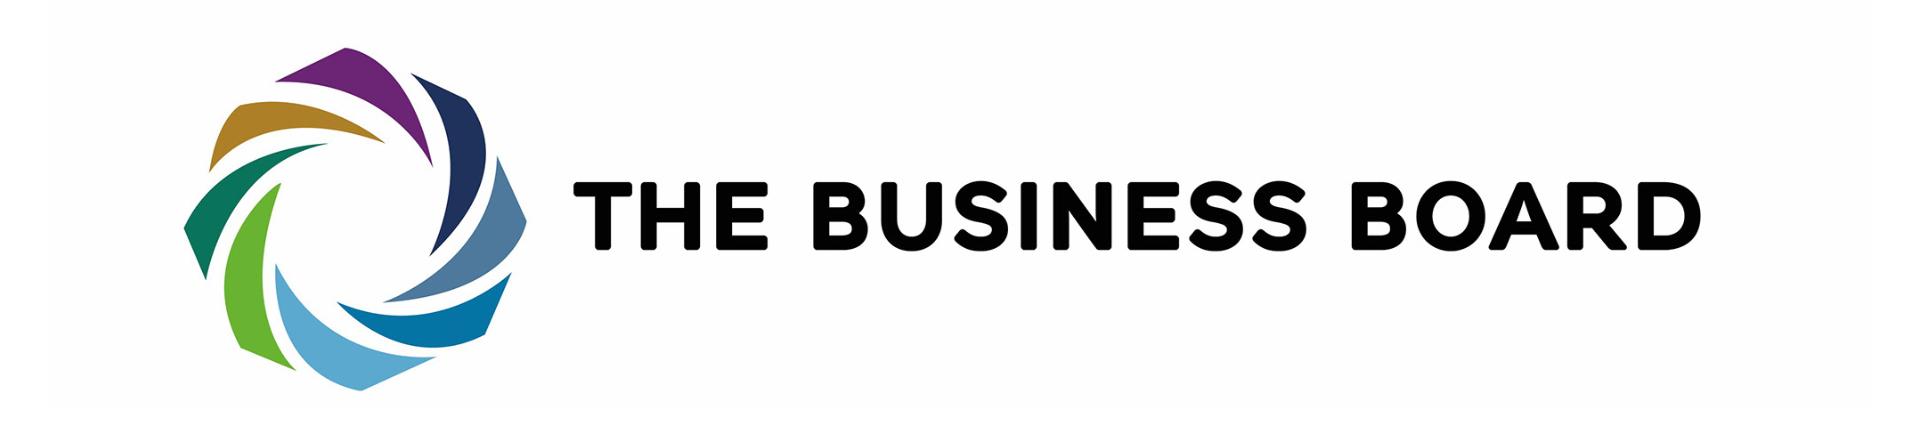 Business Board Header